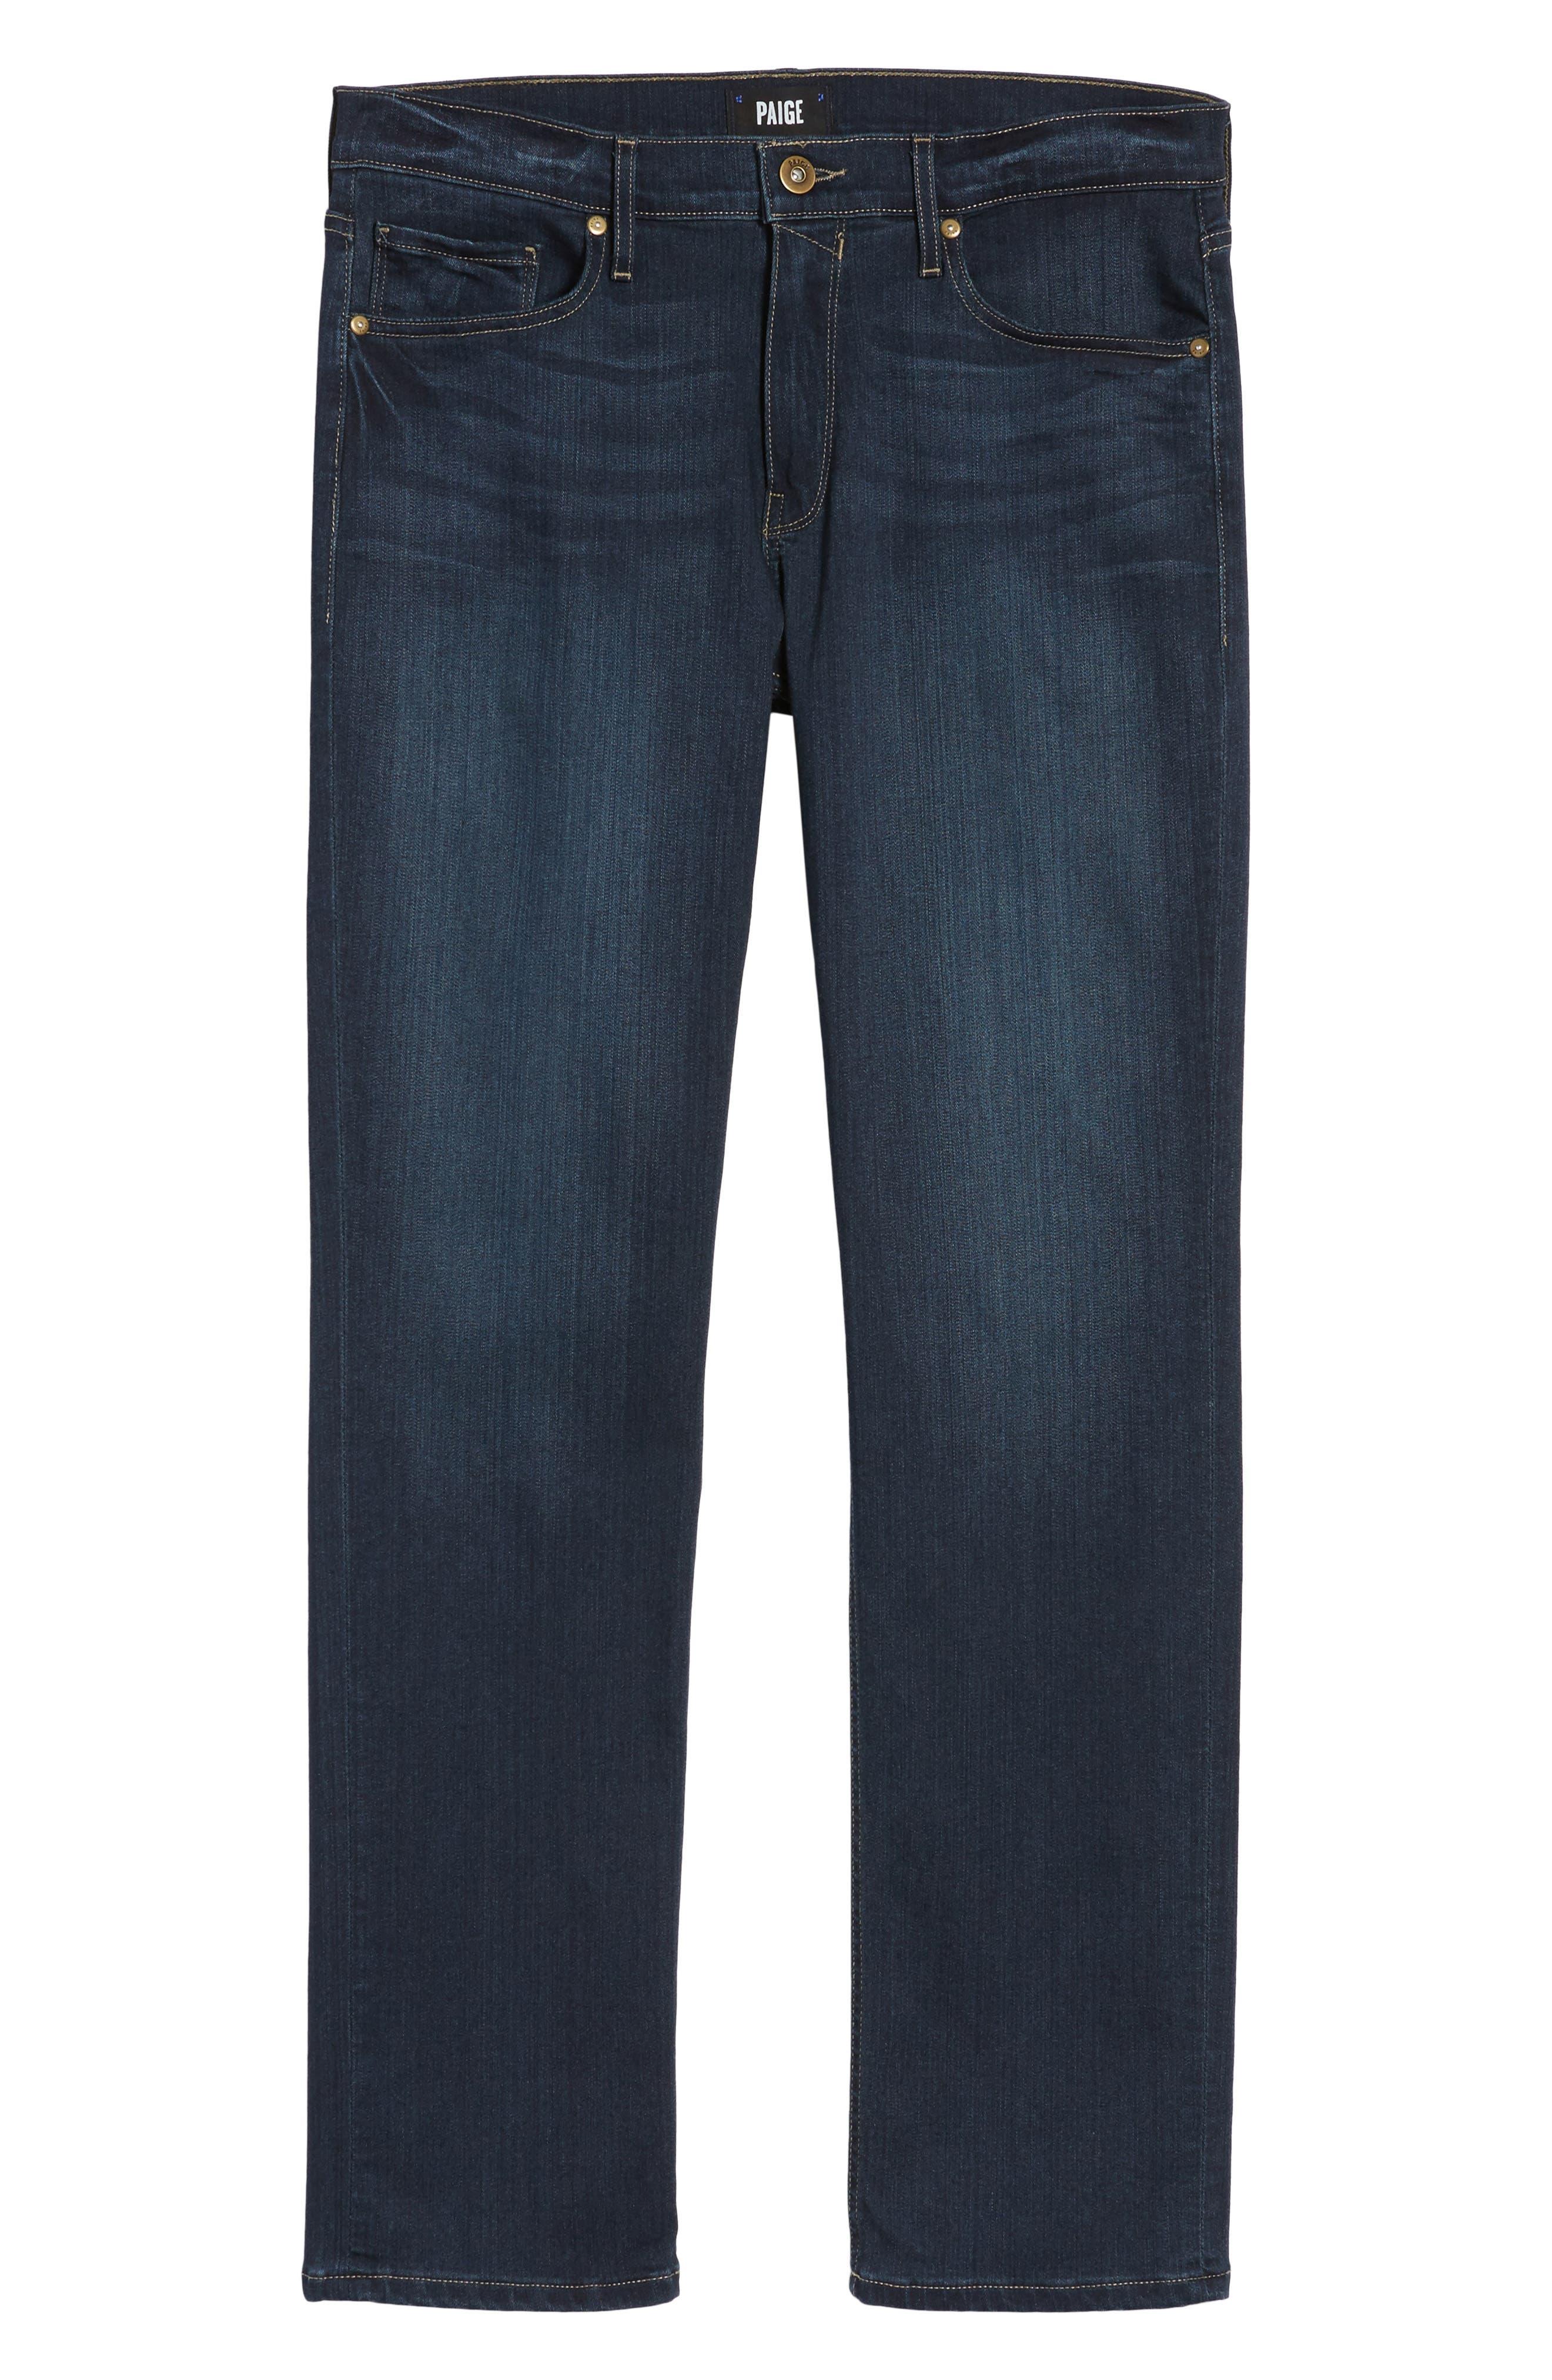 Transcend - Normandie Straight Fit Jeans,                             Alternate thumbnail 6, color,                             400